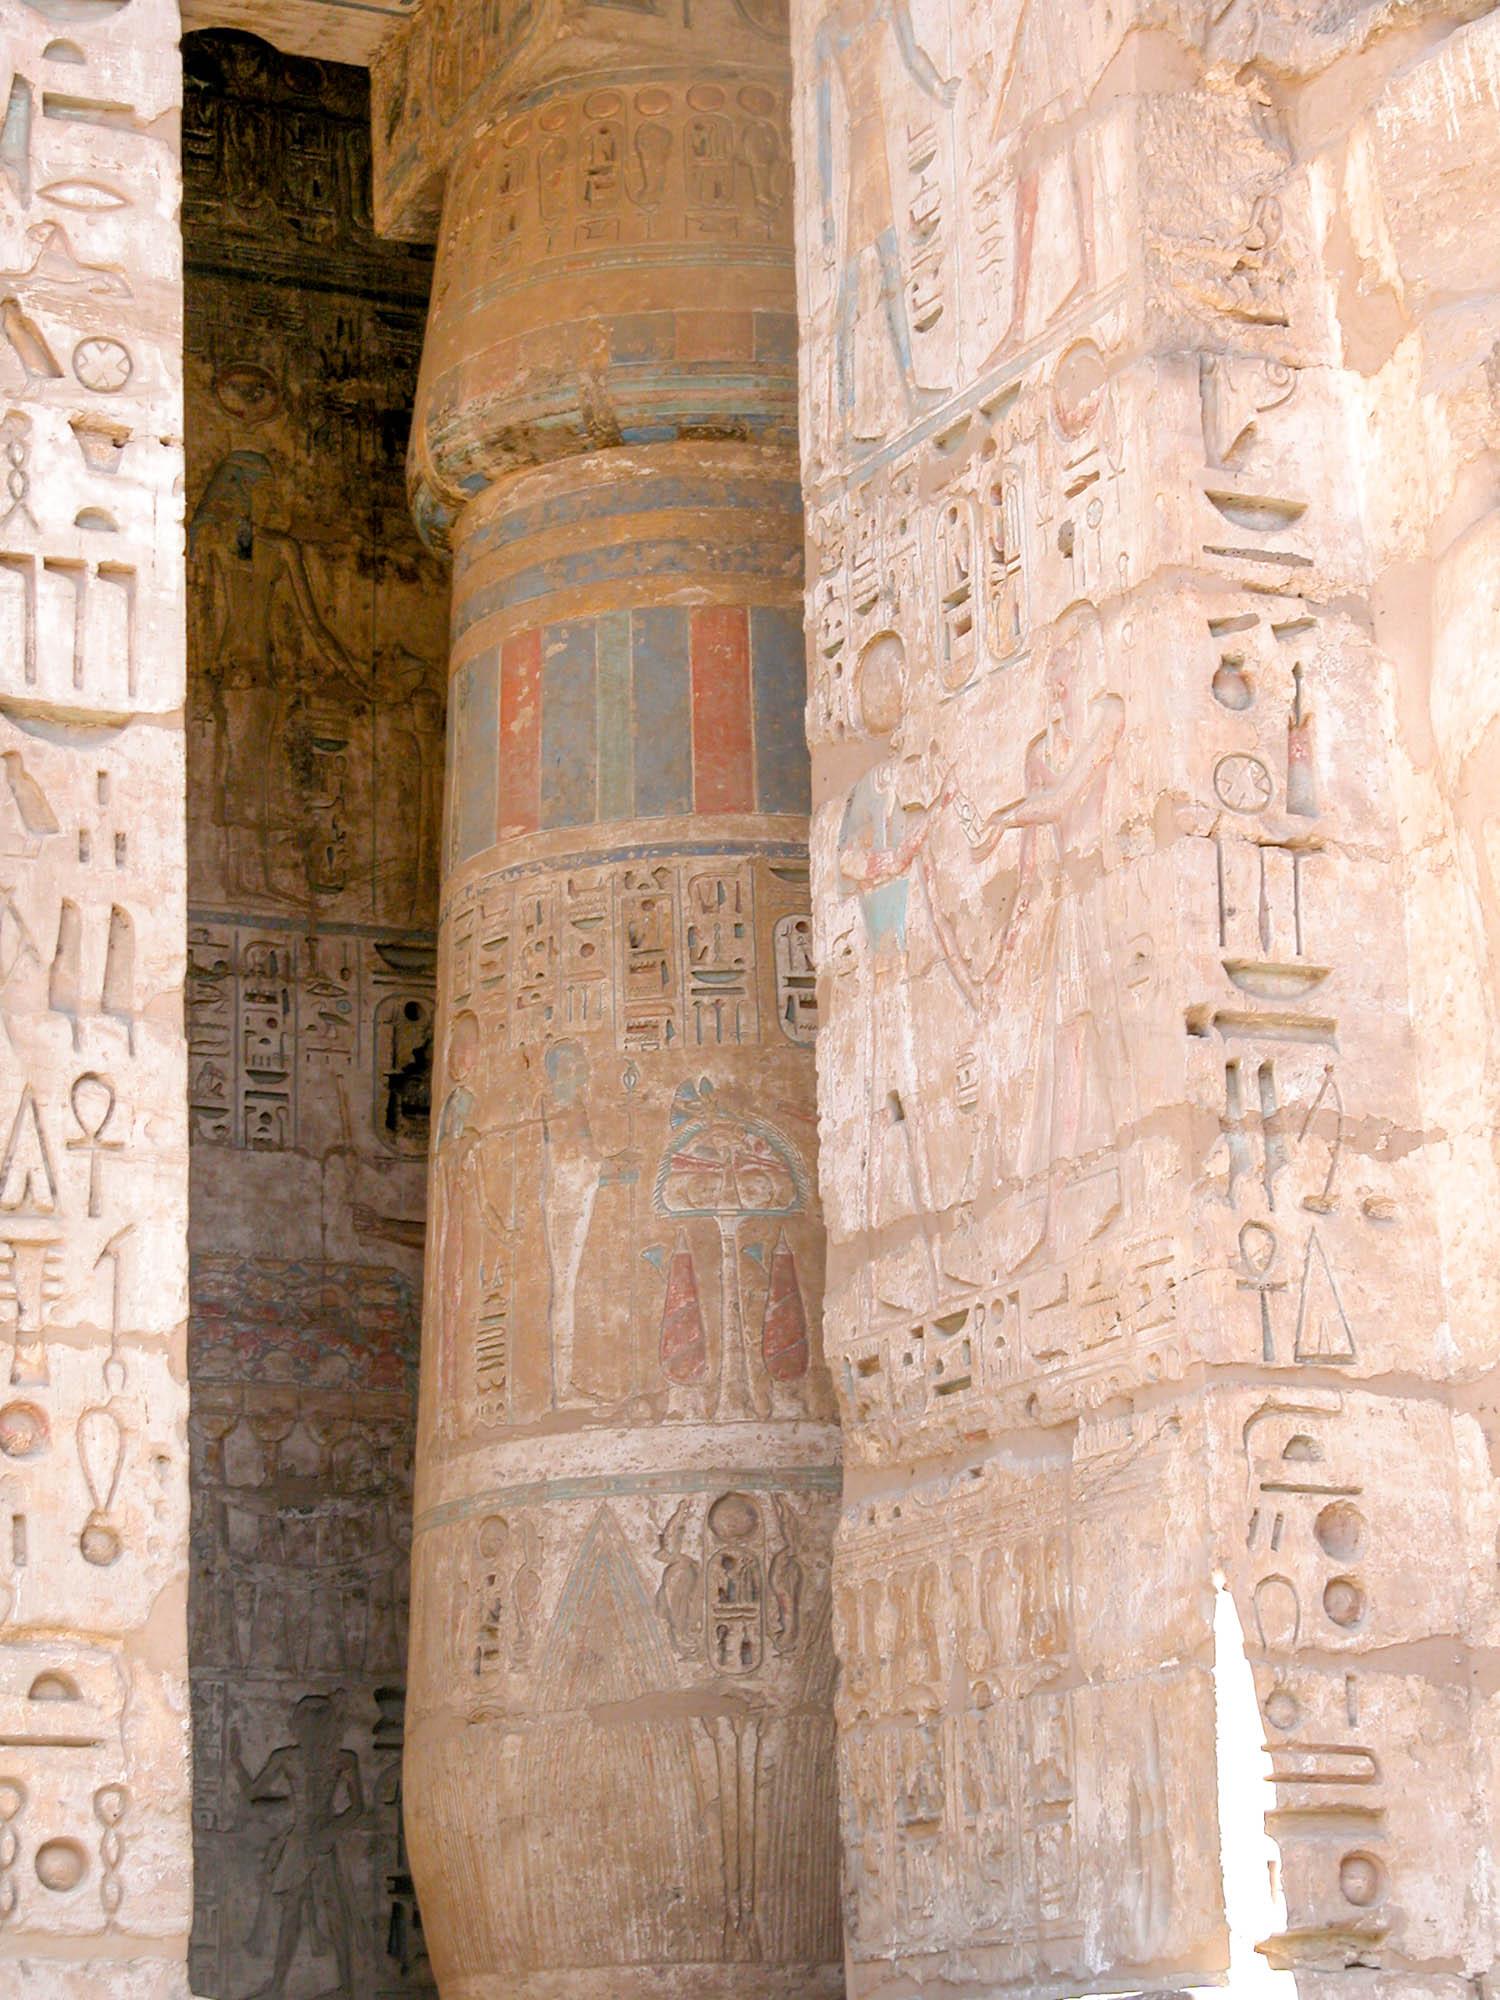 Mortuary Temple of Rameses III at Medinet Habu